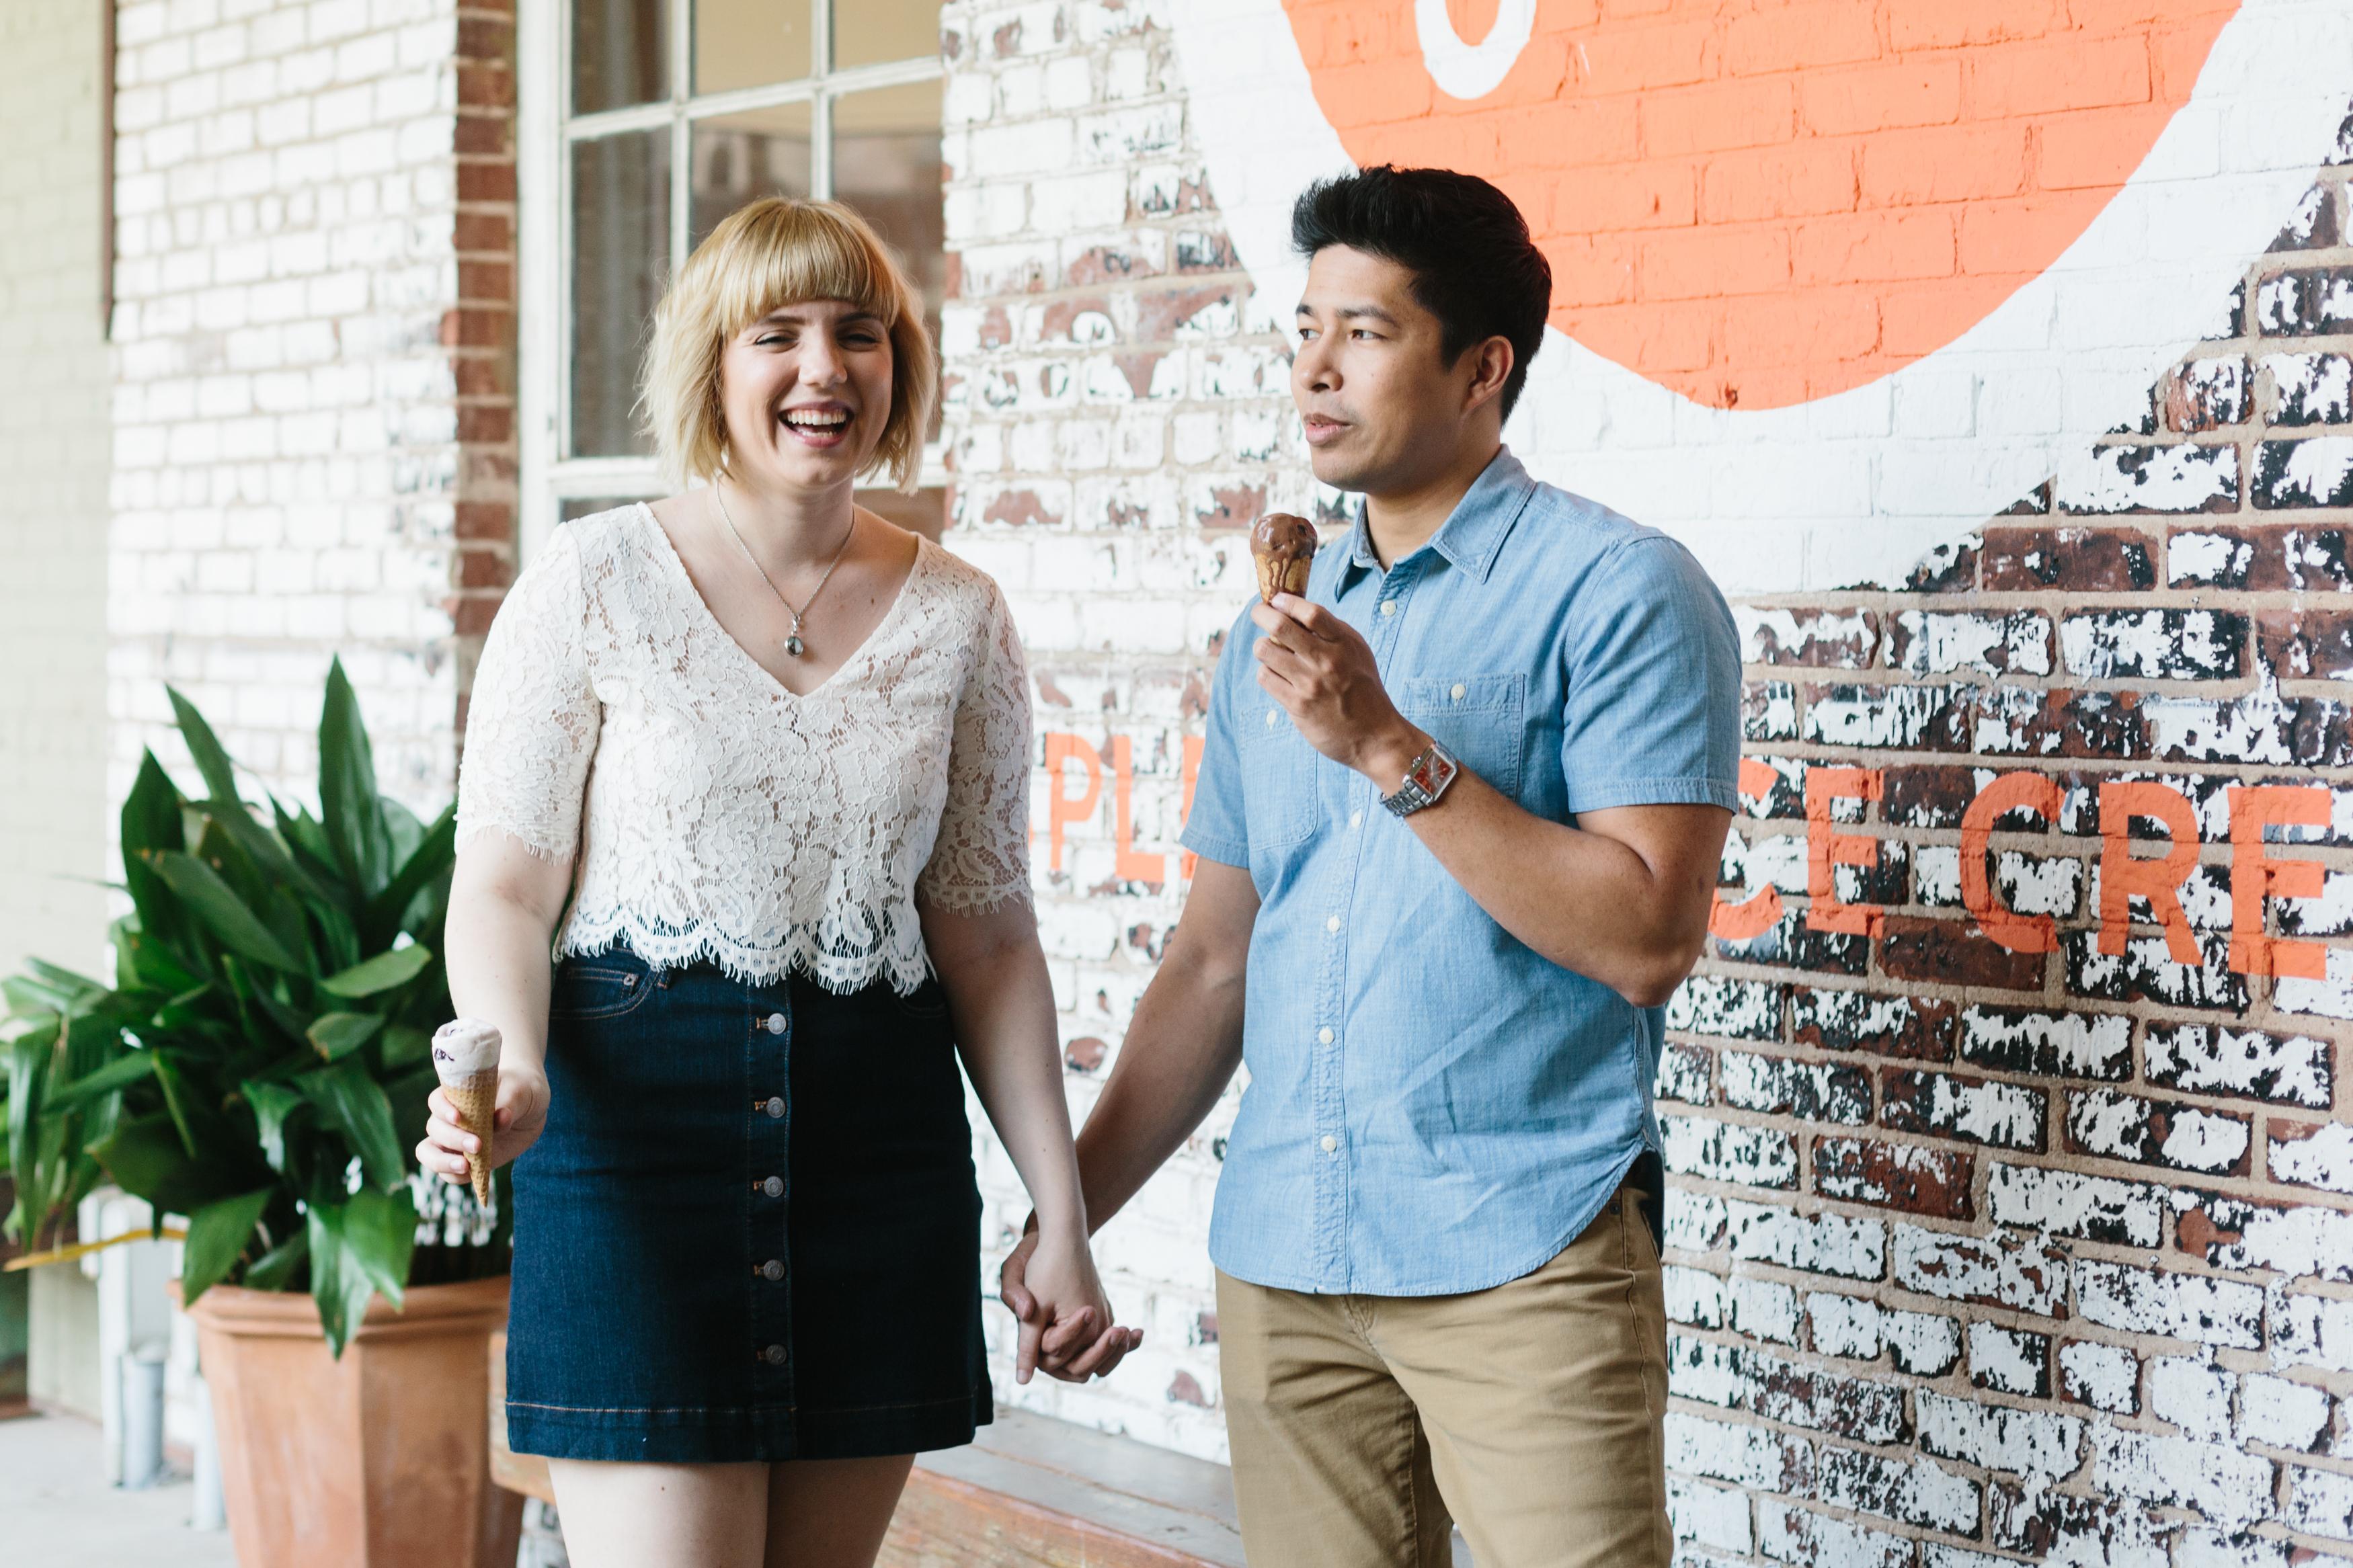 jenis ice cream engagement